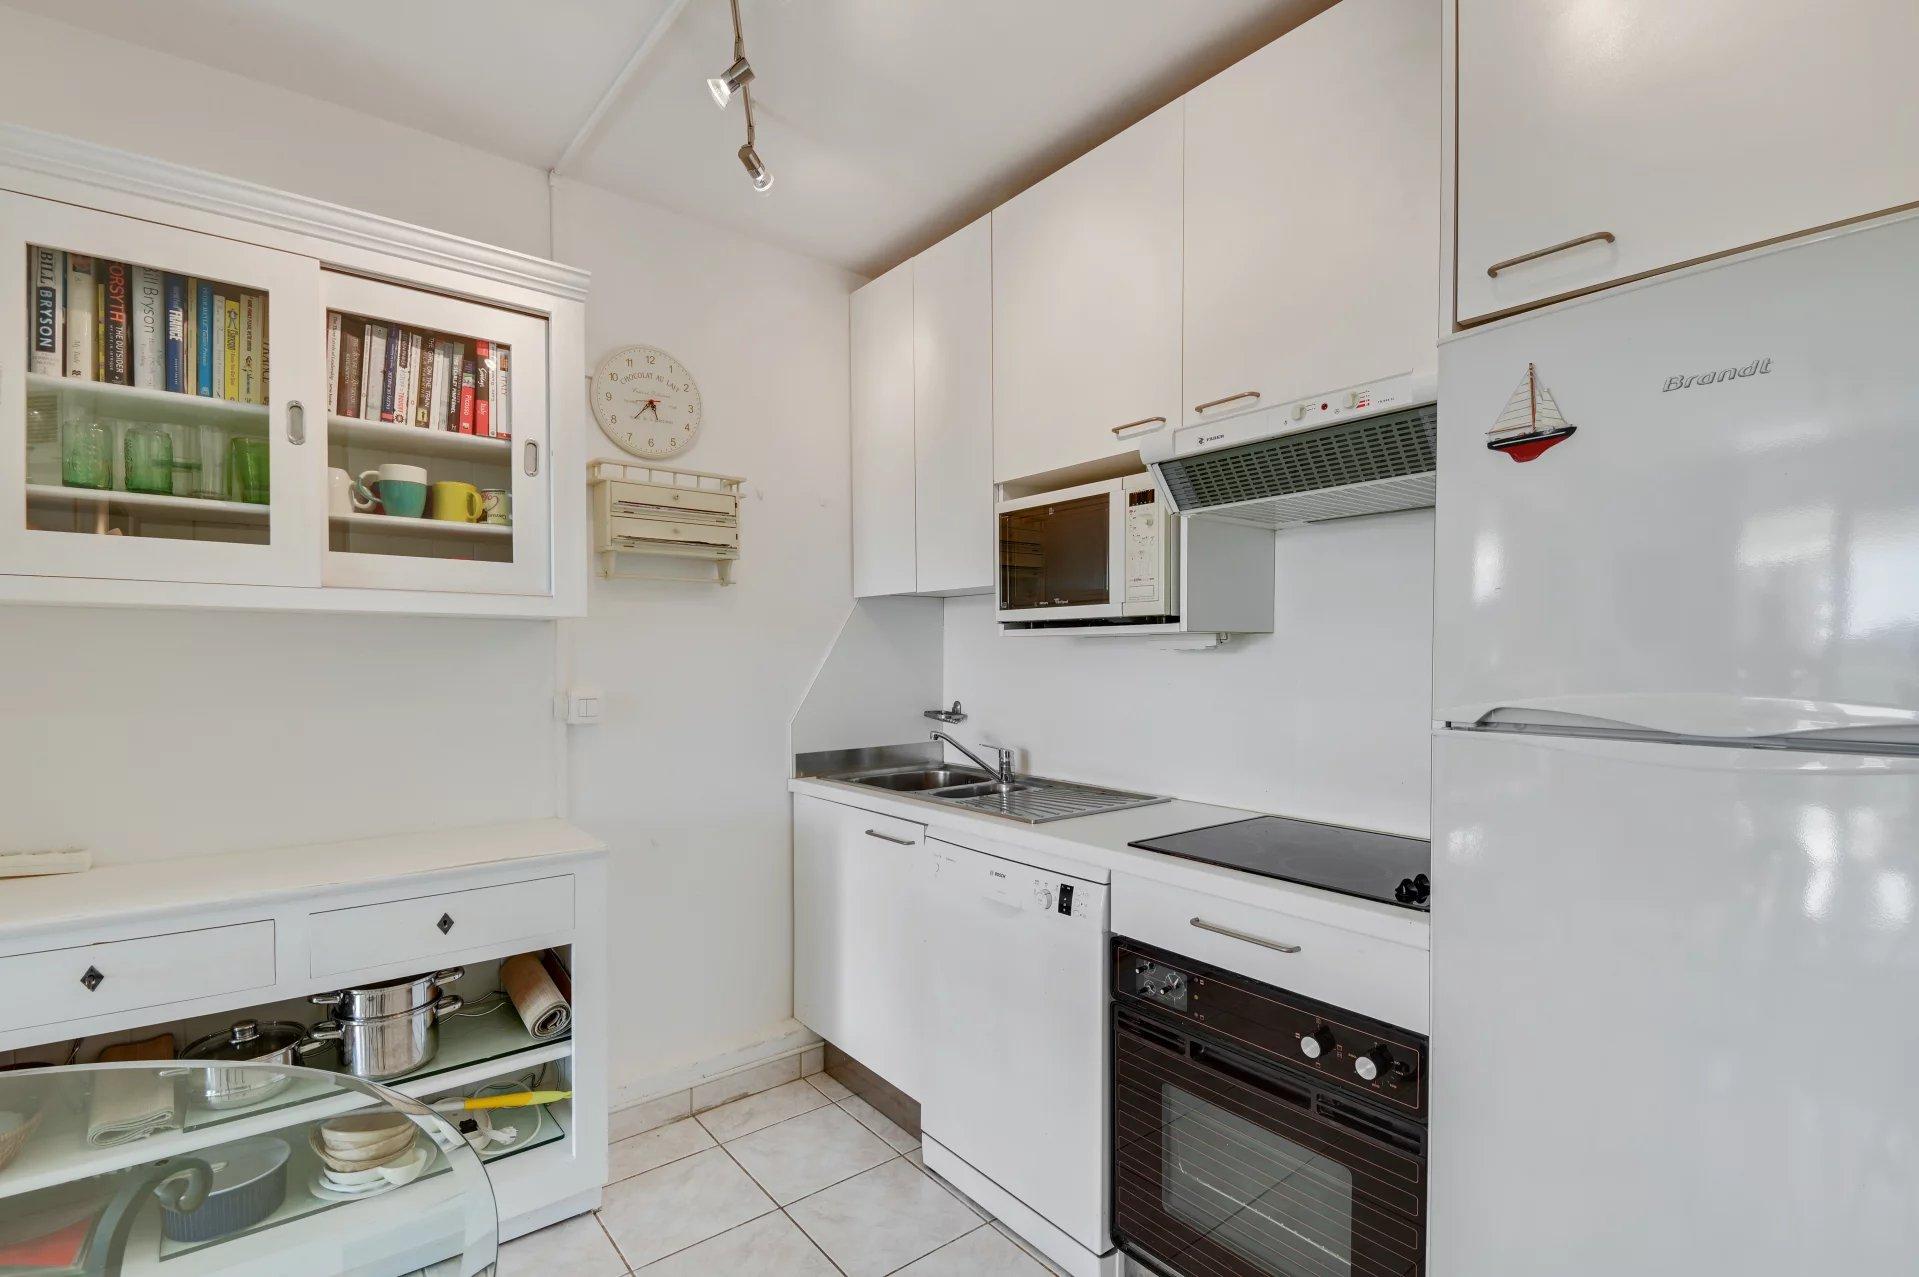 Sole Agent, Mandelieu Cannes Marina 1 bedroom apartment